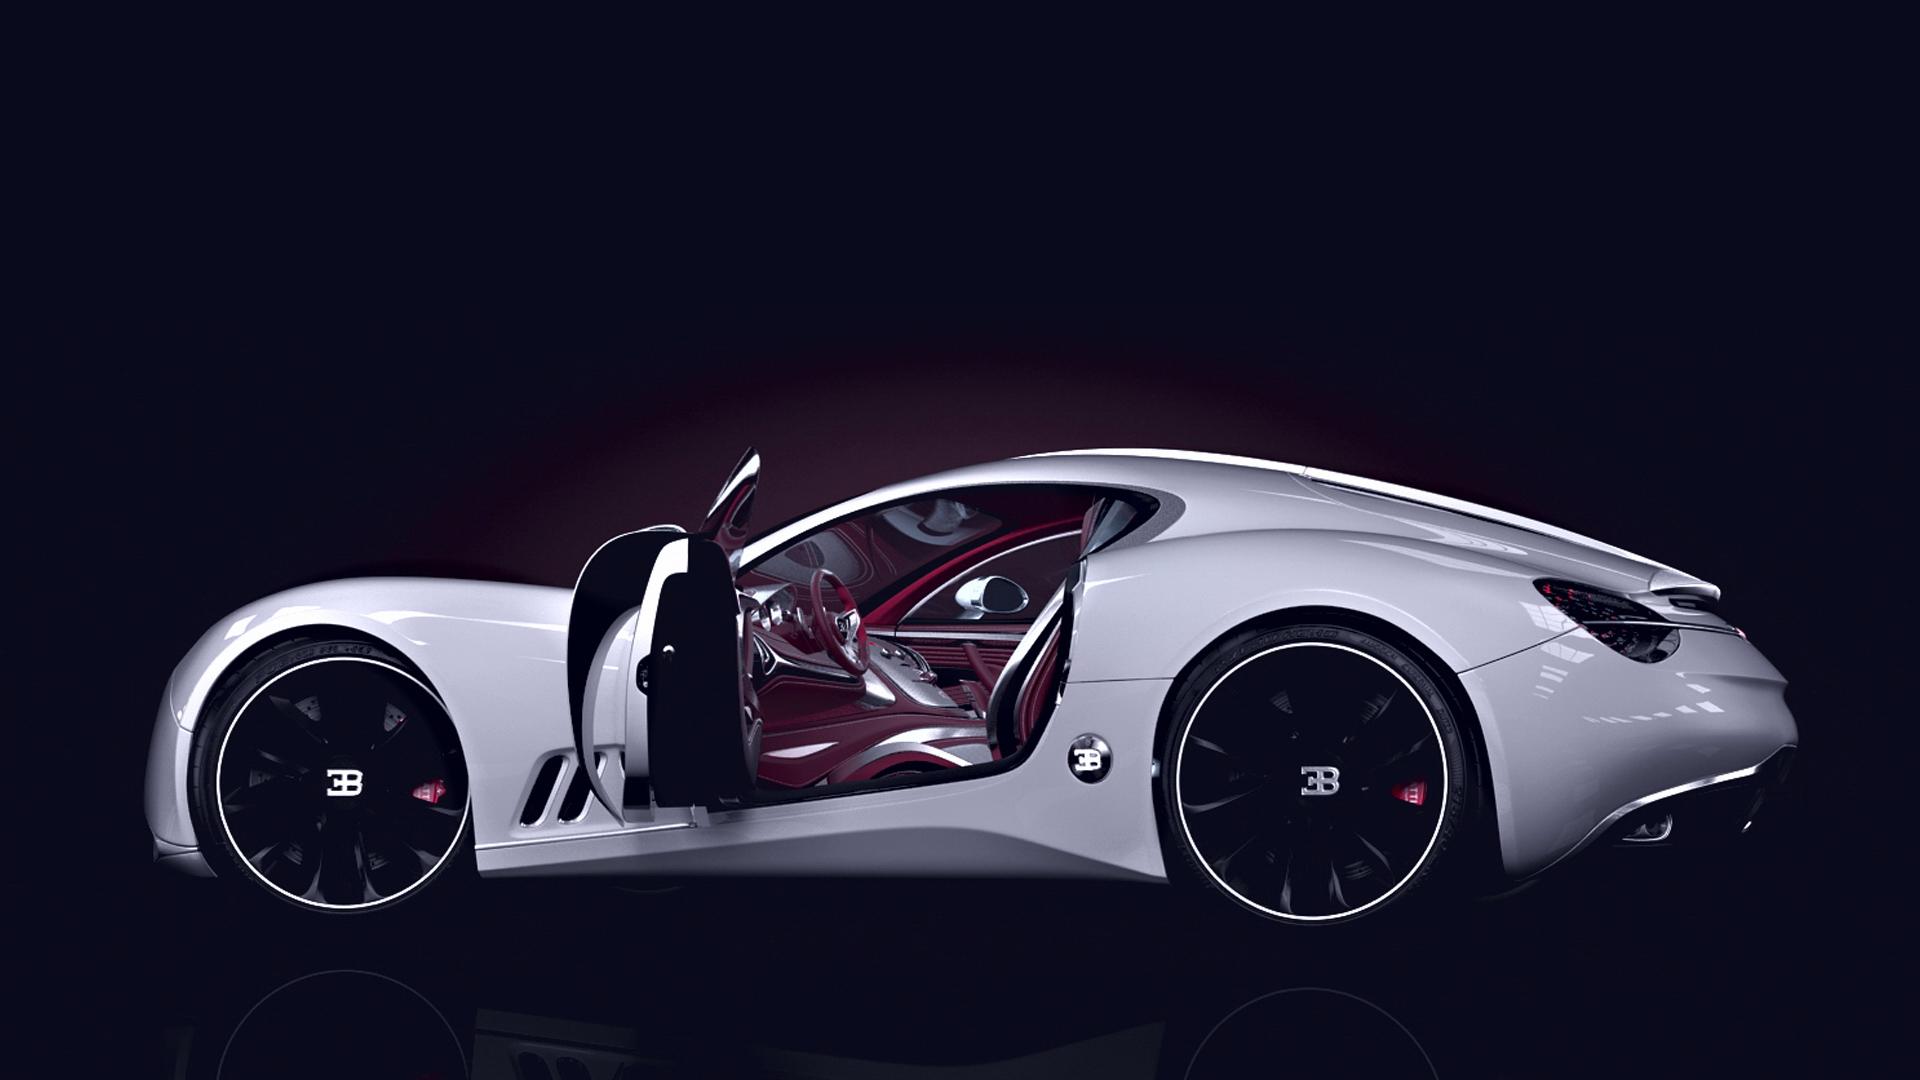 Girls Of The Wilds Wallpaper Car Body Design Of Bugatti Gangloff Concept